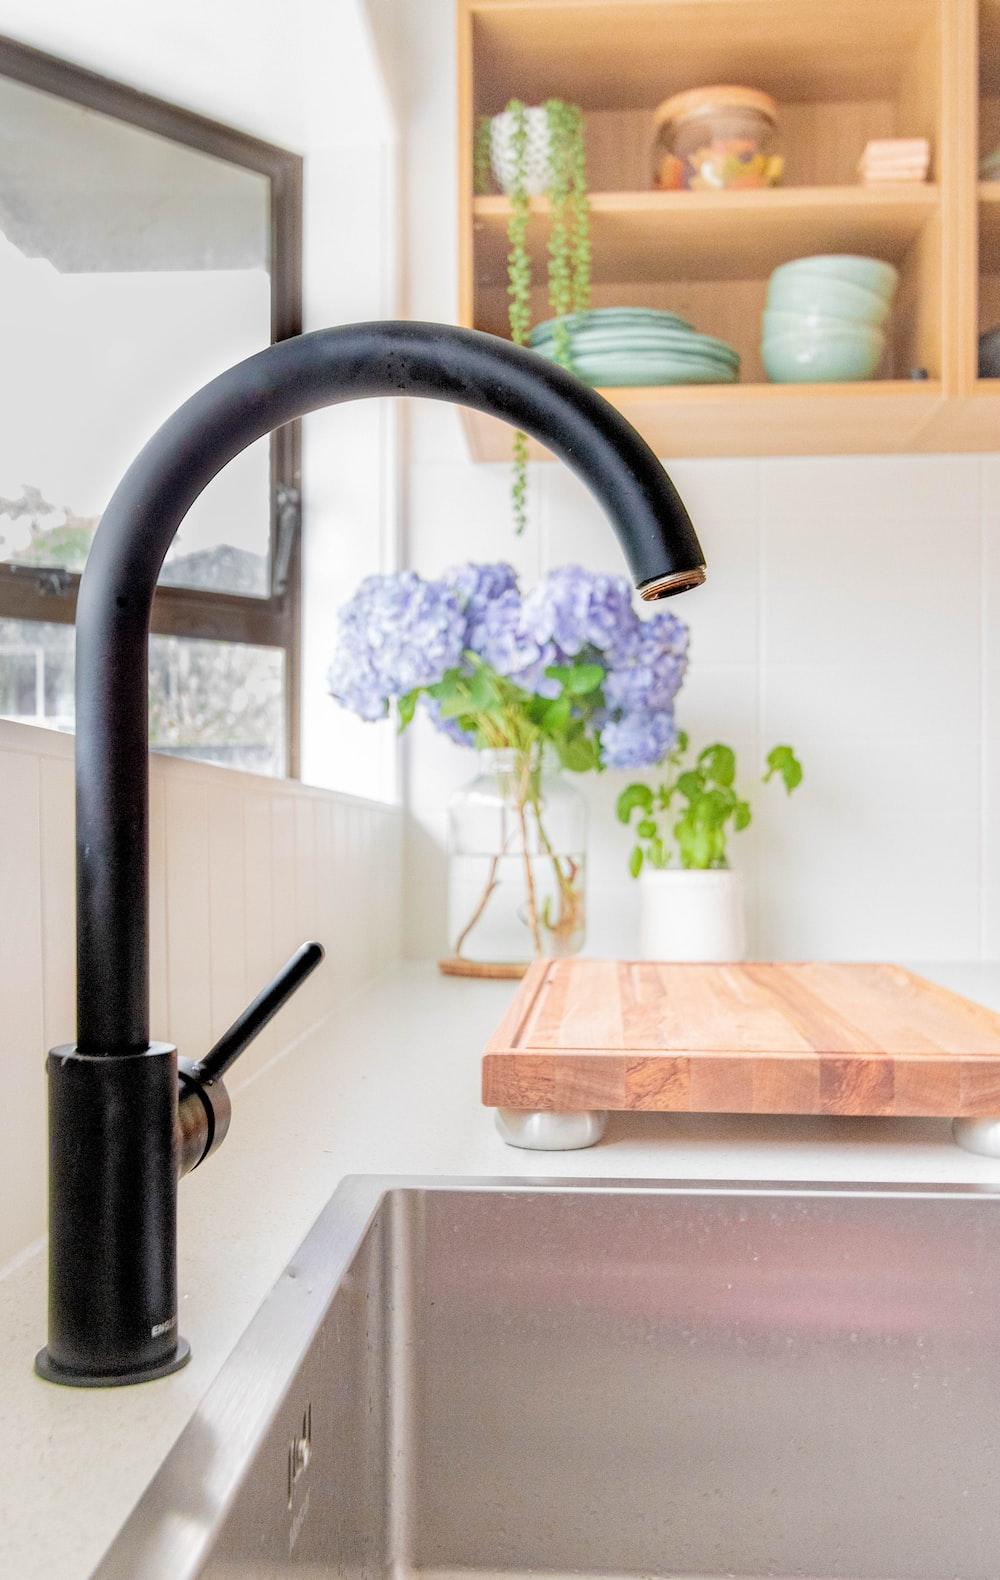 black metal faucet near brown wooden chopping board